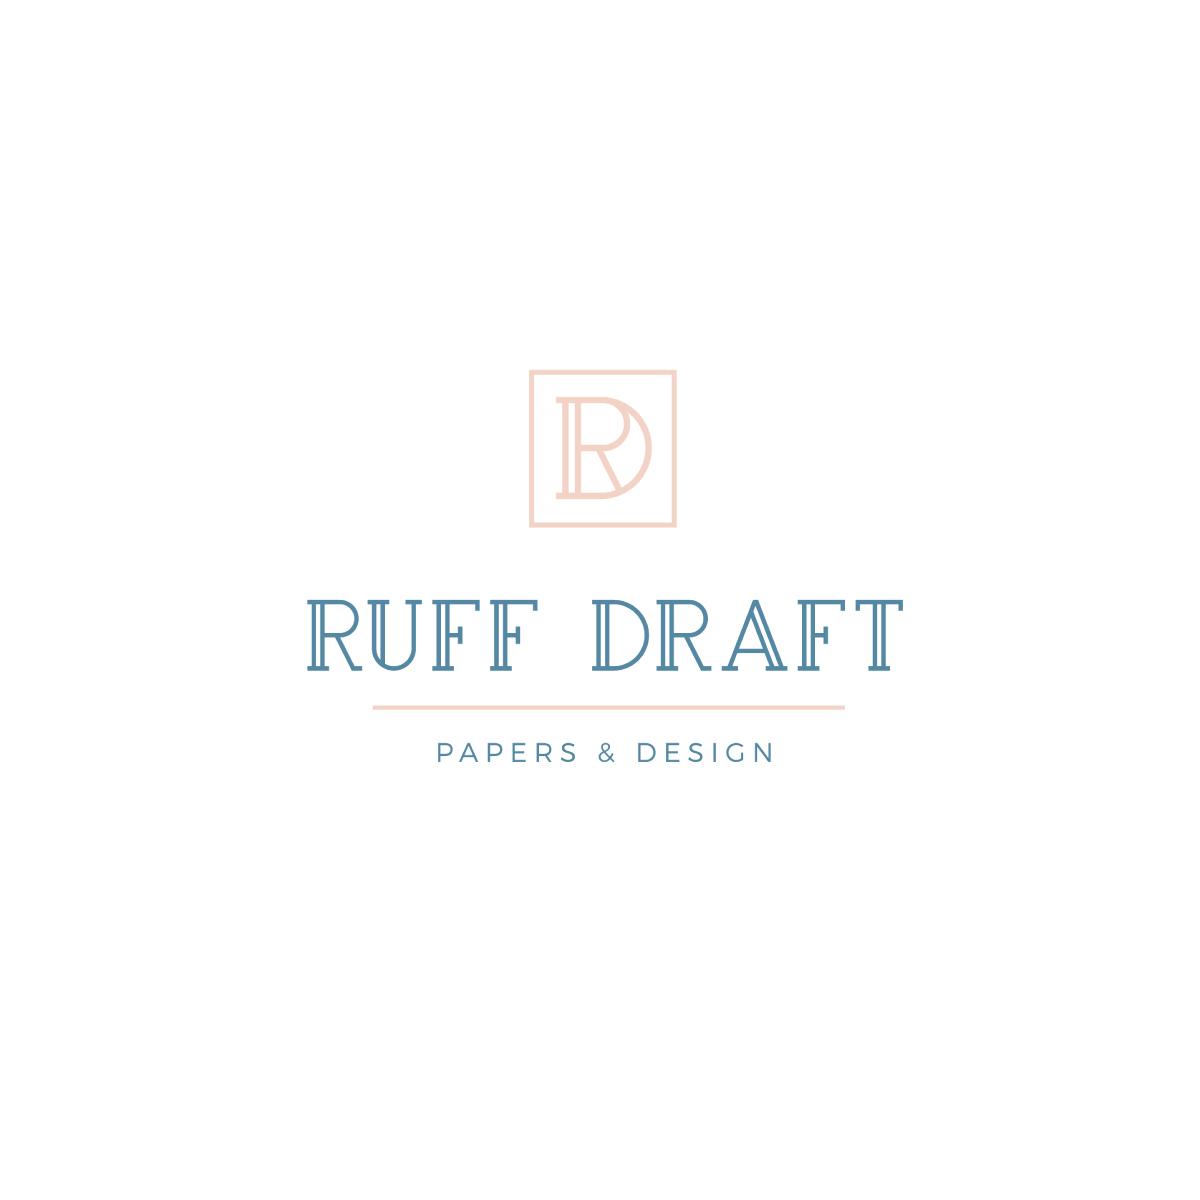 RD-Logo-150dpi_web.jpg